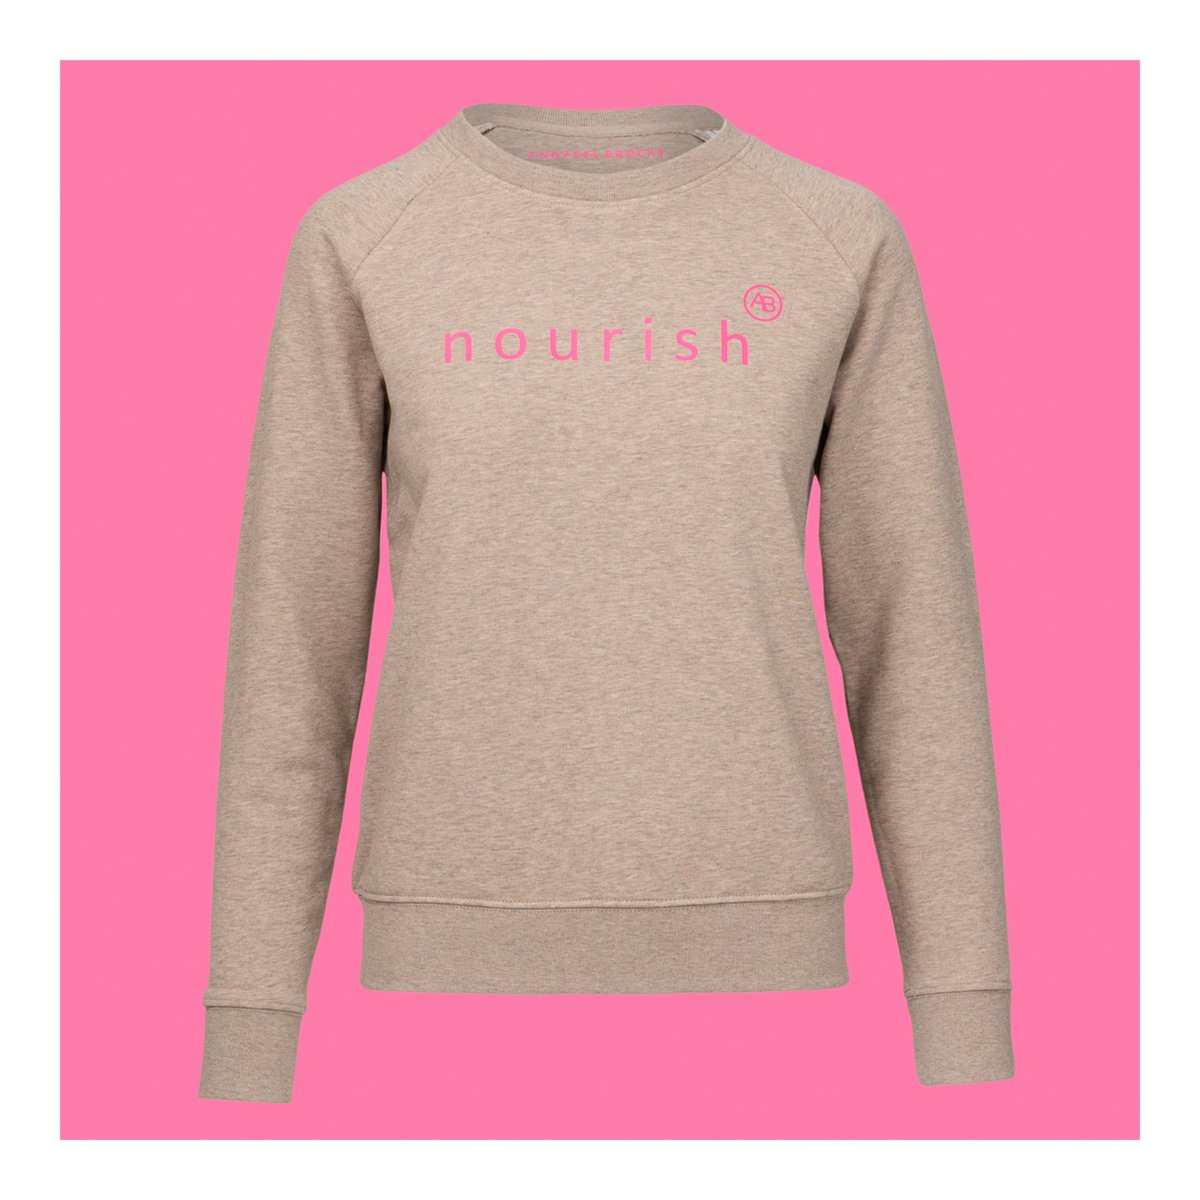 I Love Cuore Rosa Suffolk KIDS T-SHIRT